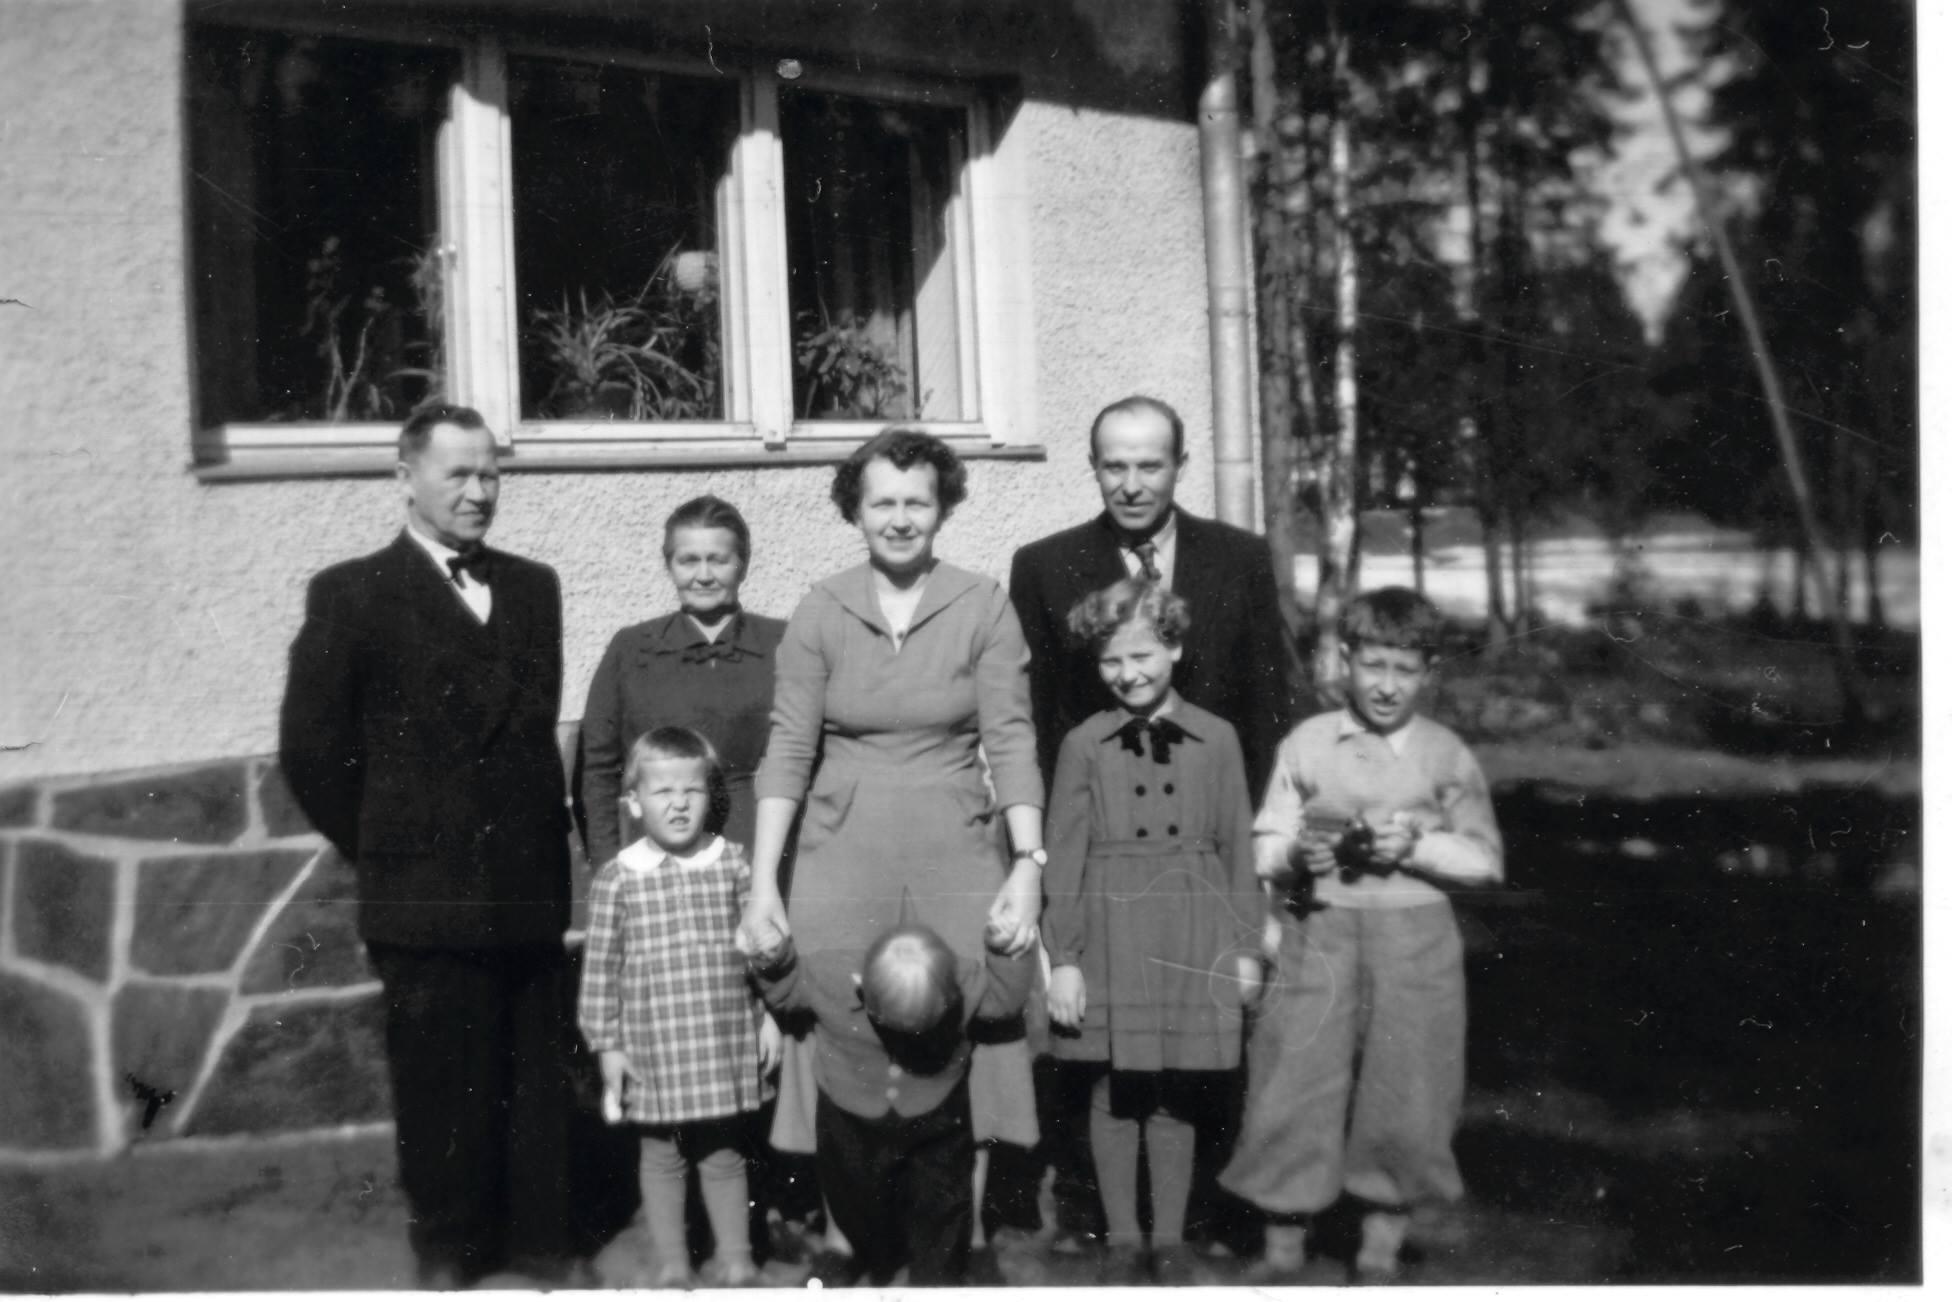 S-VK-1119W - Sulo ja Siiri Salmelan perhe